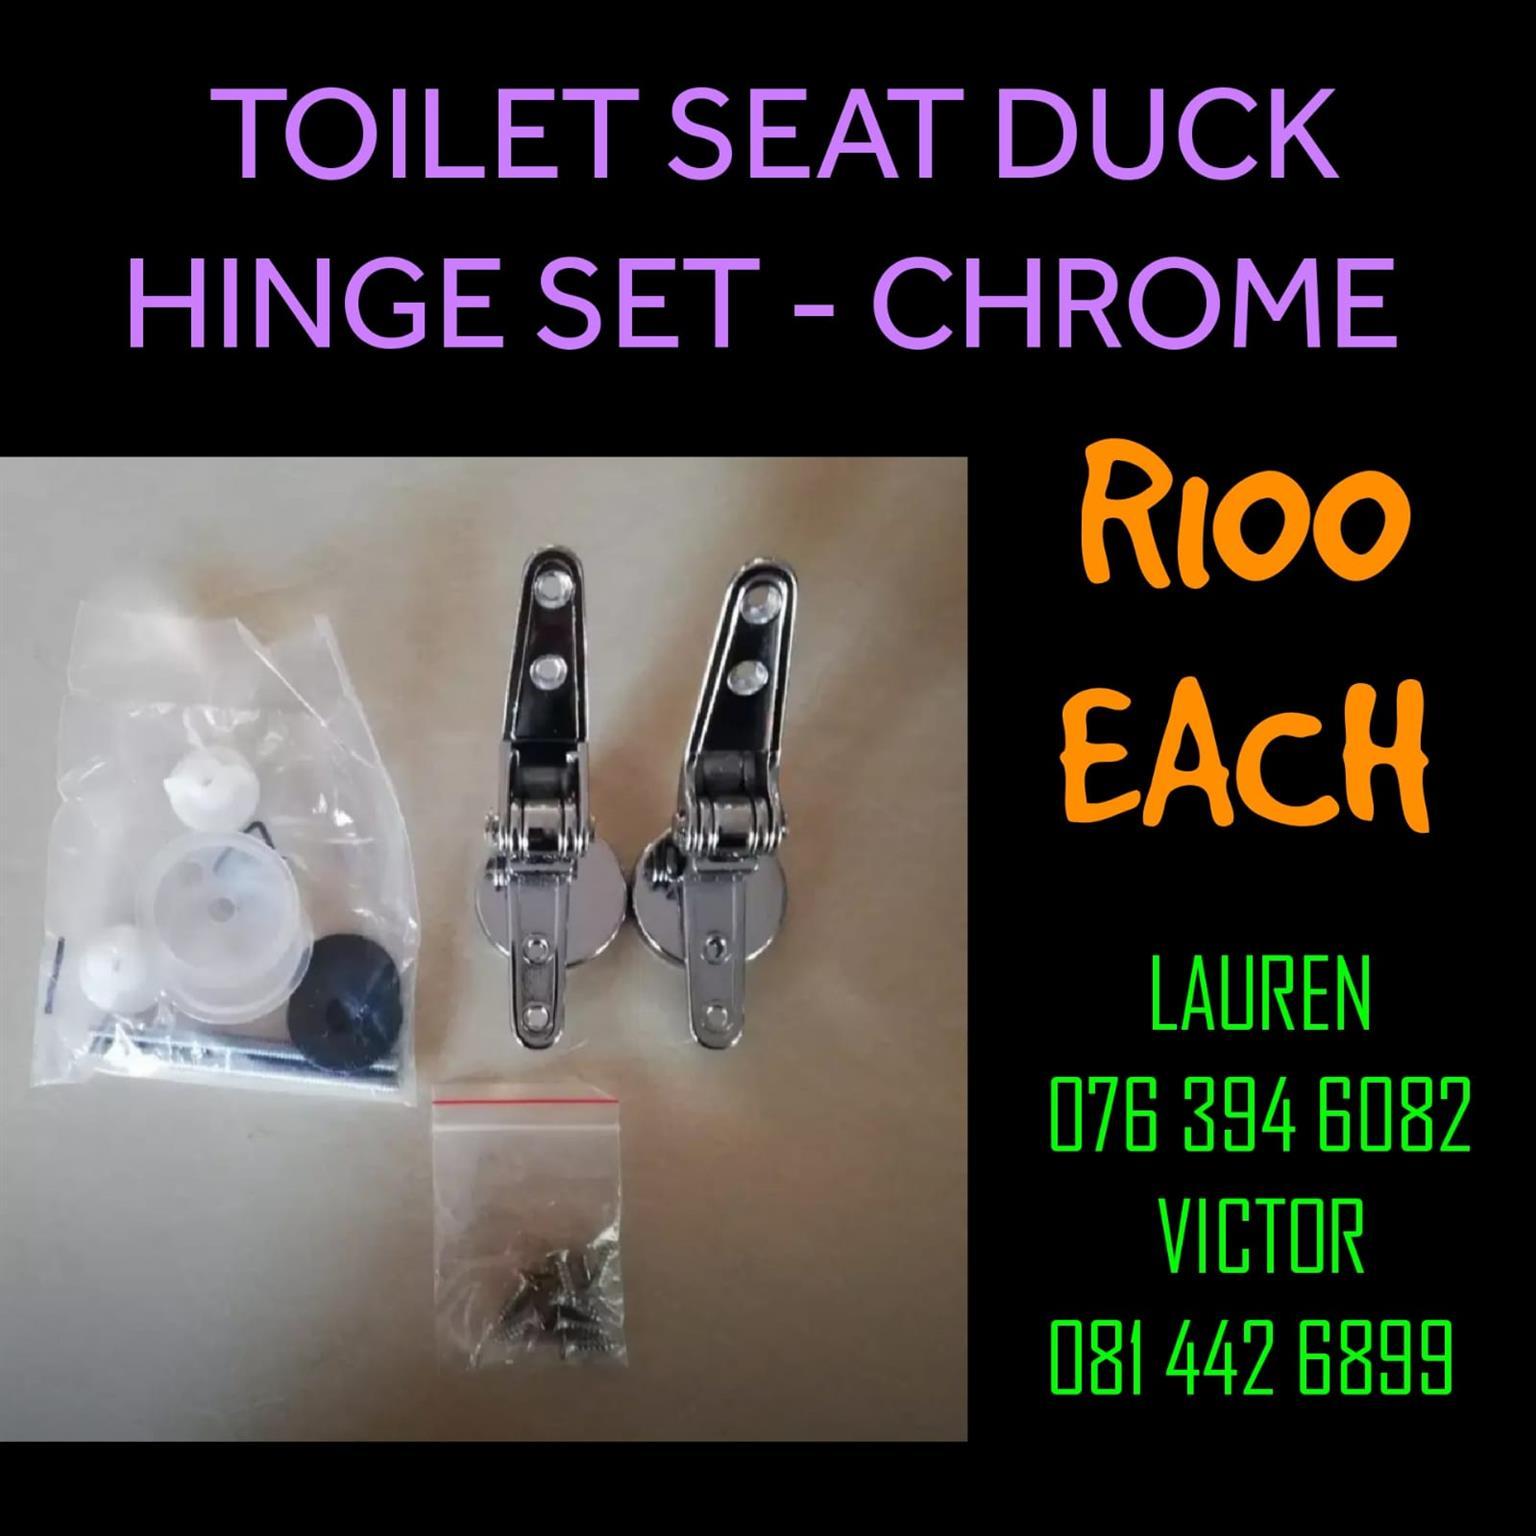 SEAT DUCK HINGE